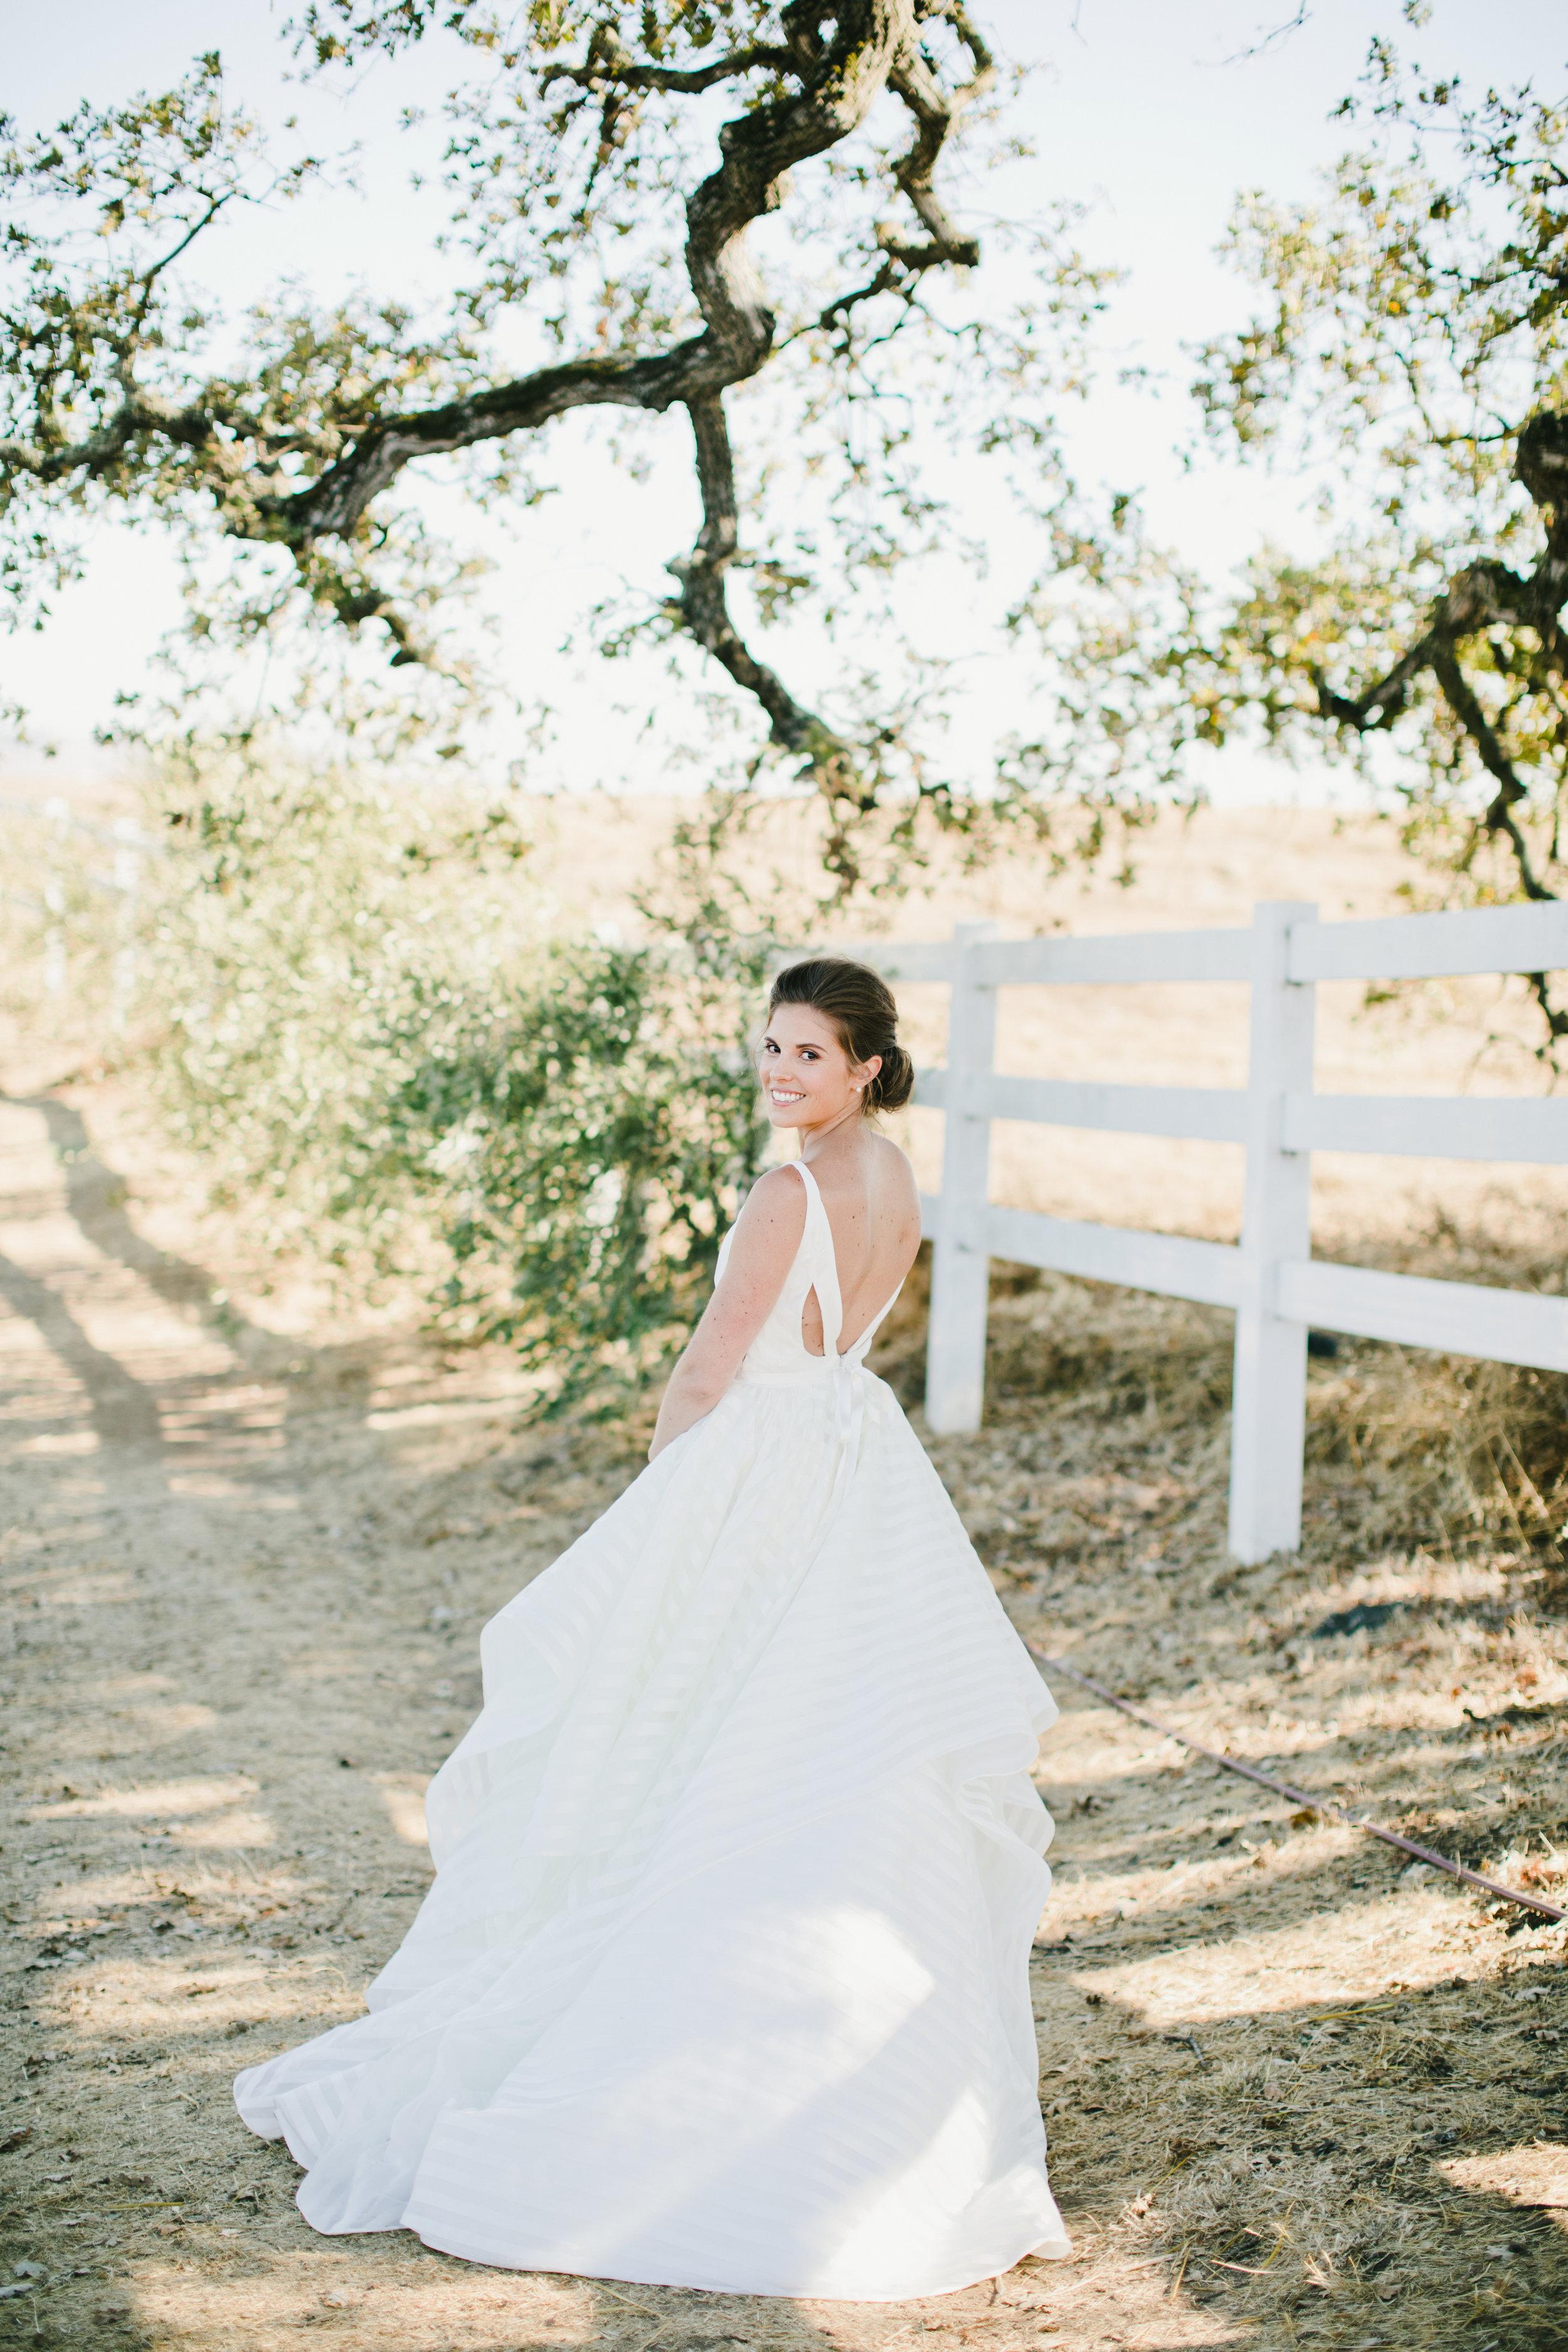 napa-makeup-and-hair-sonoma-makeup-artist-marin-wedding-makeup-san-francisco-airbrush-makeup-1.JPG